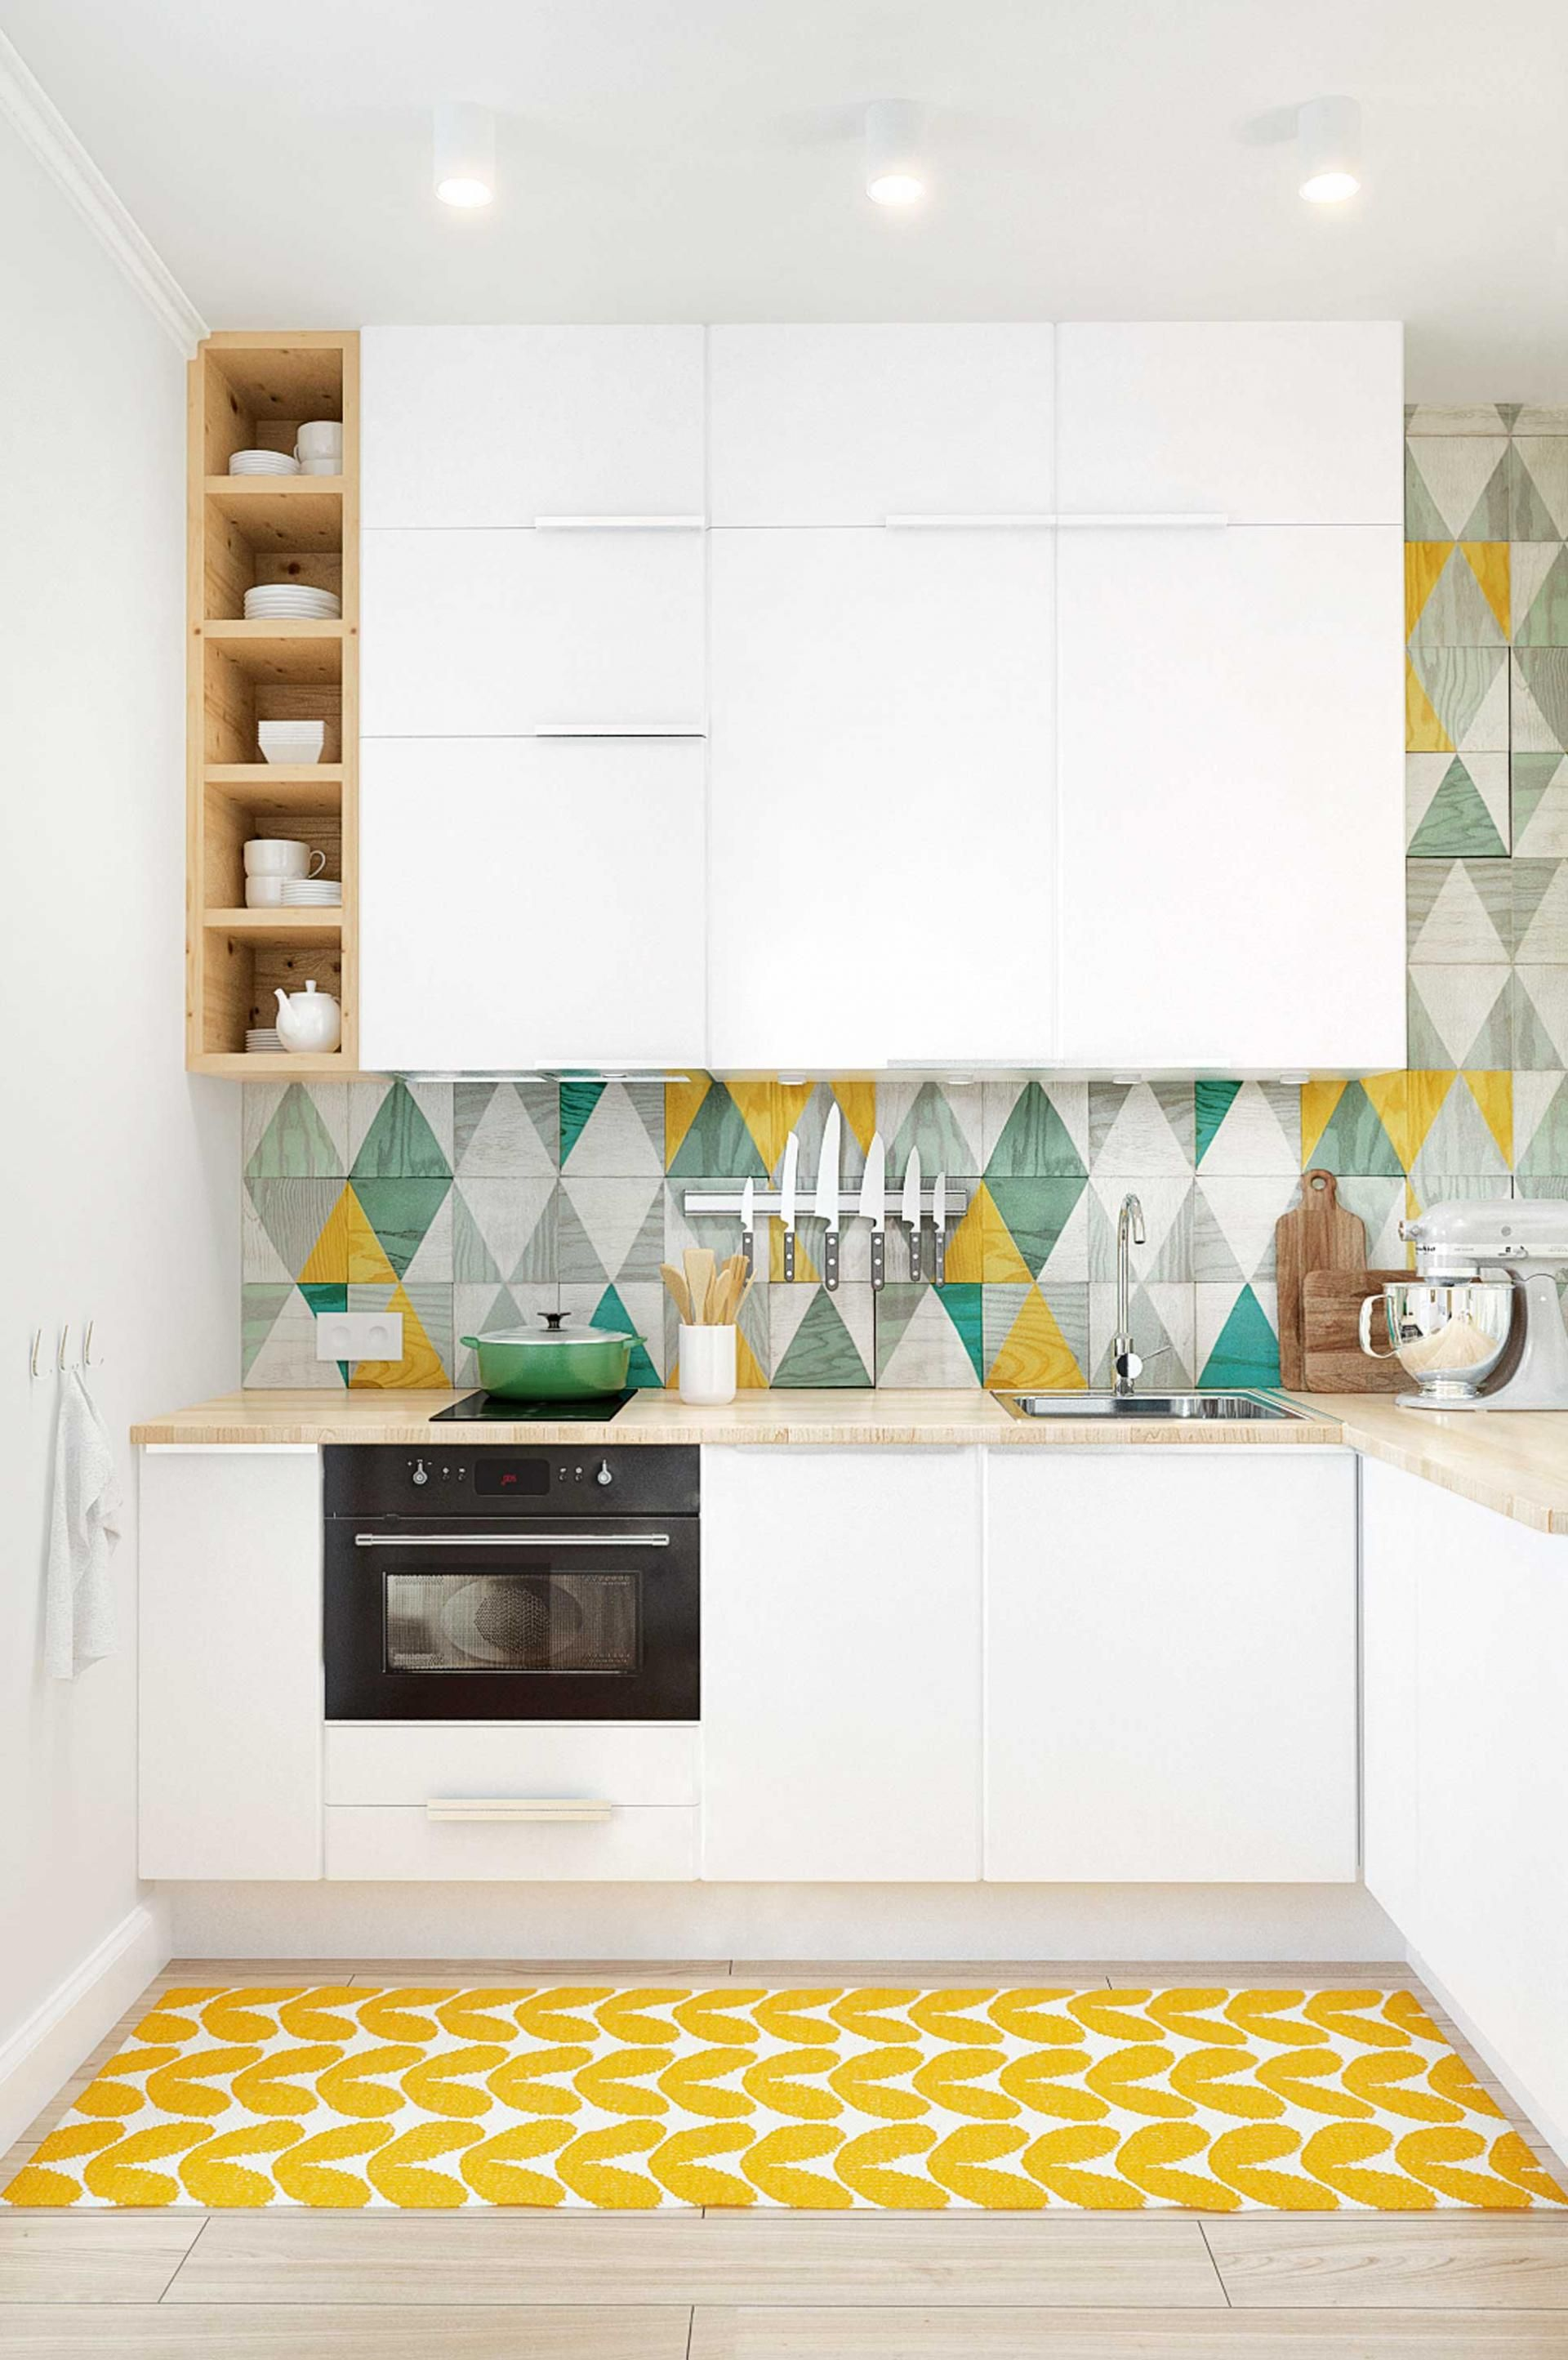 Best images about kitchen i n t e r i o r on Pinterest